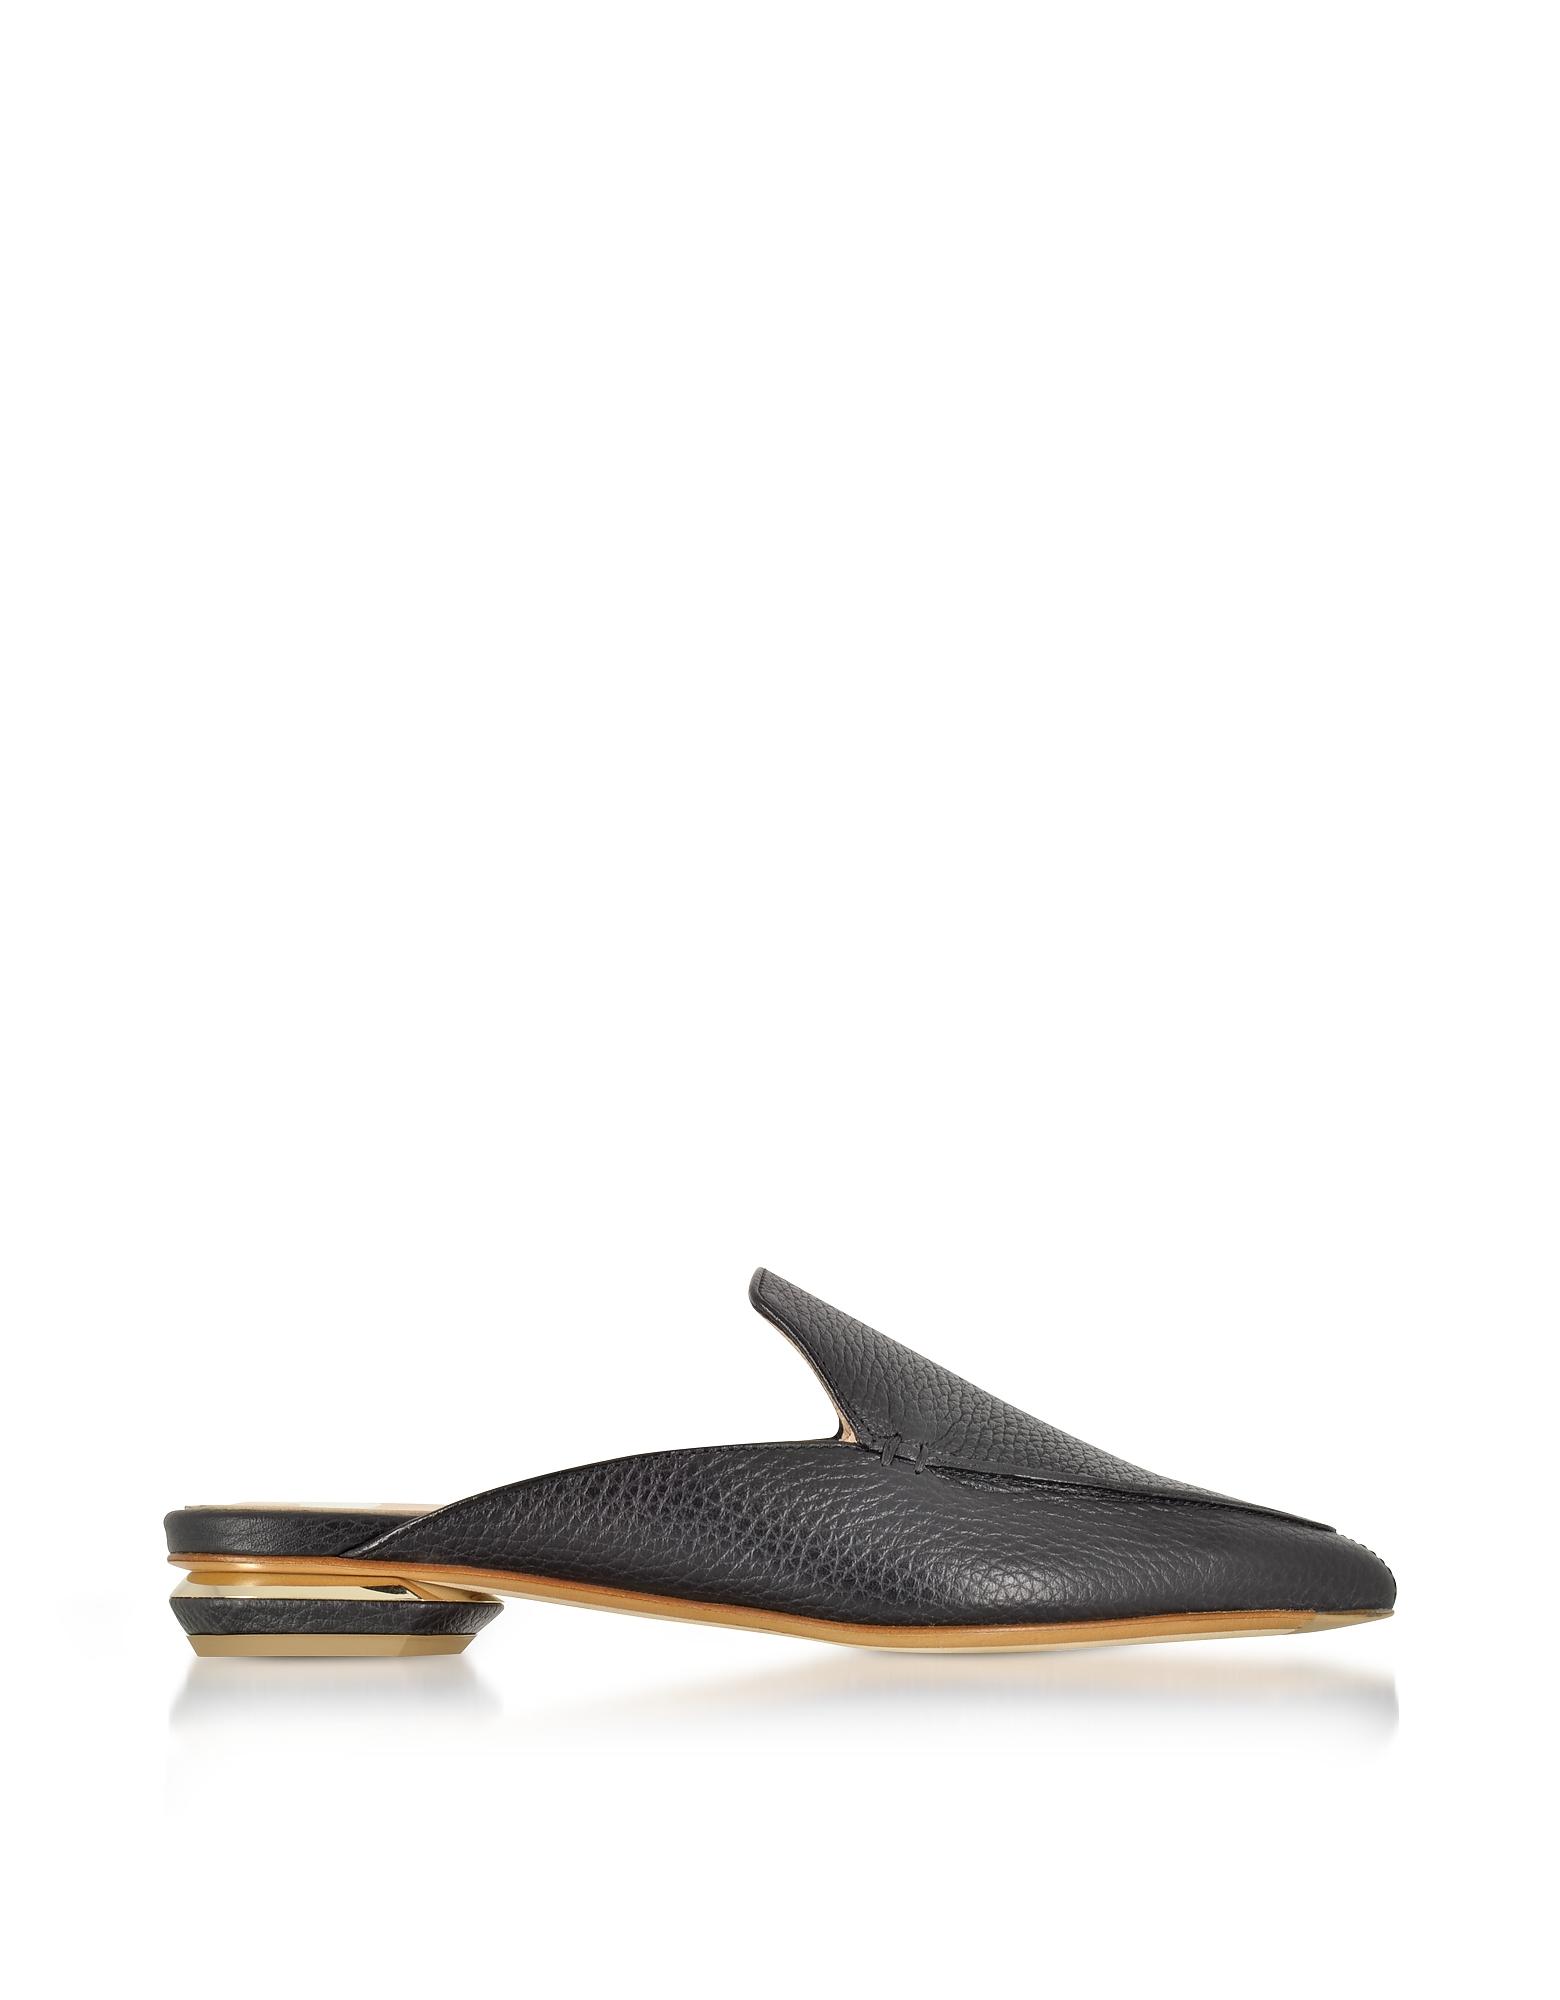 Nicholas Kirkwood Shoes, Beya Black Tumbled Leather Mules